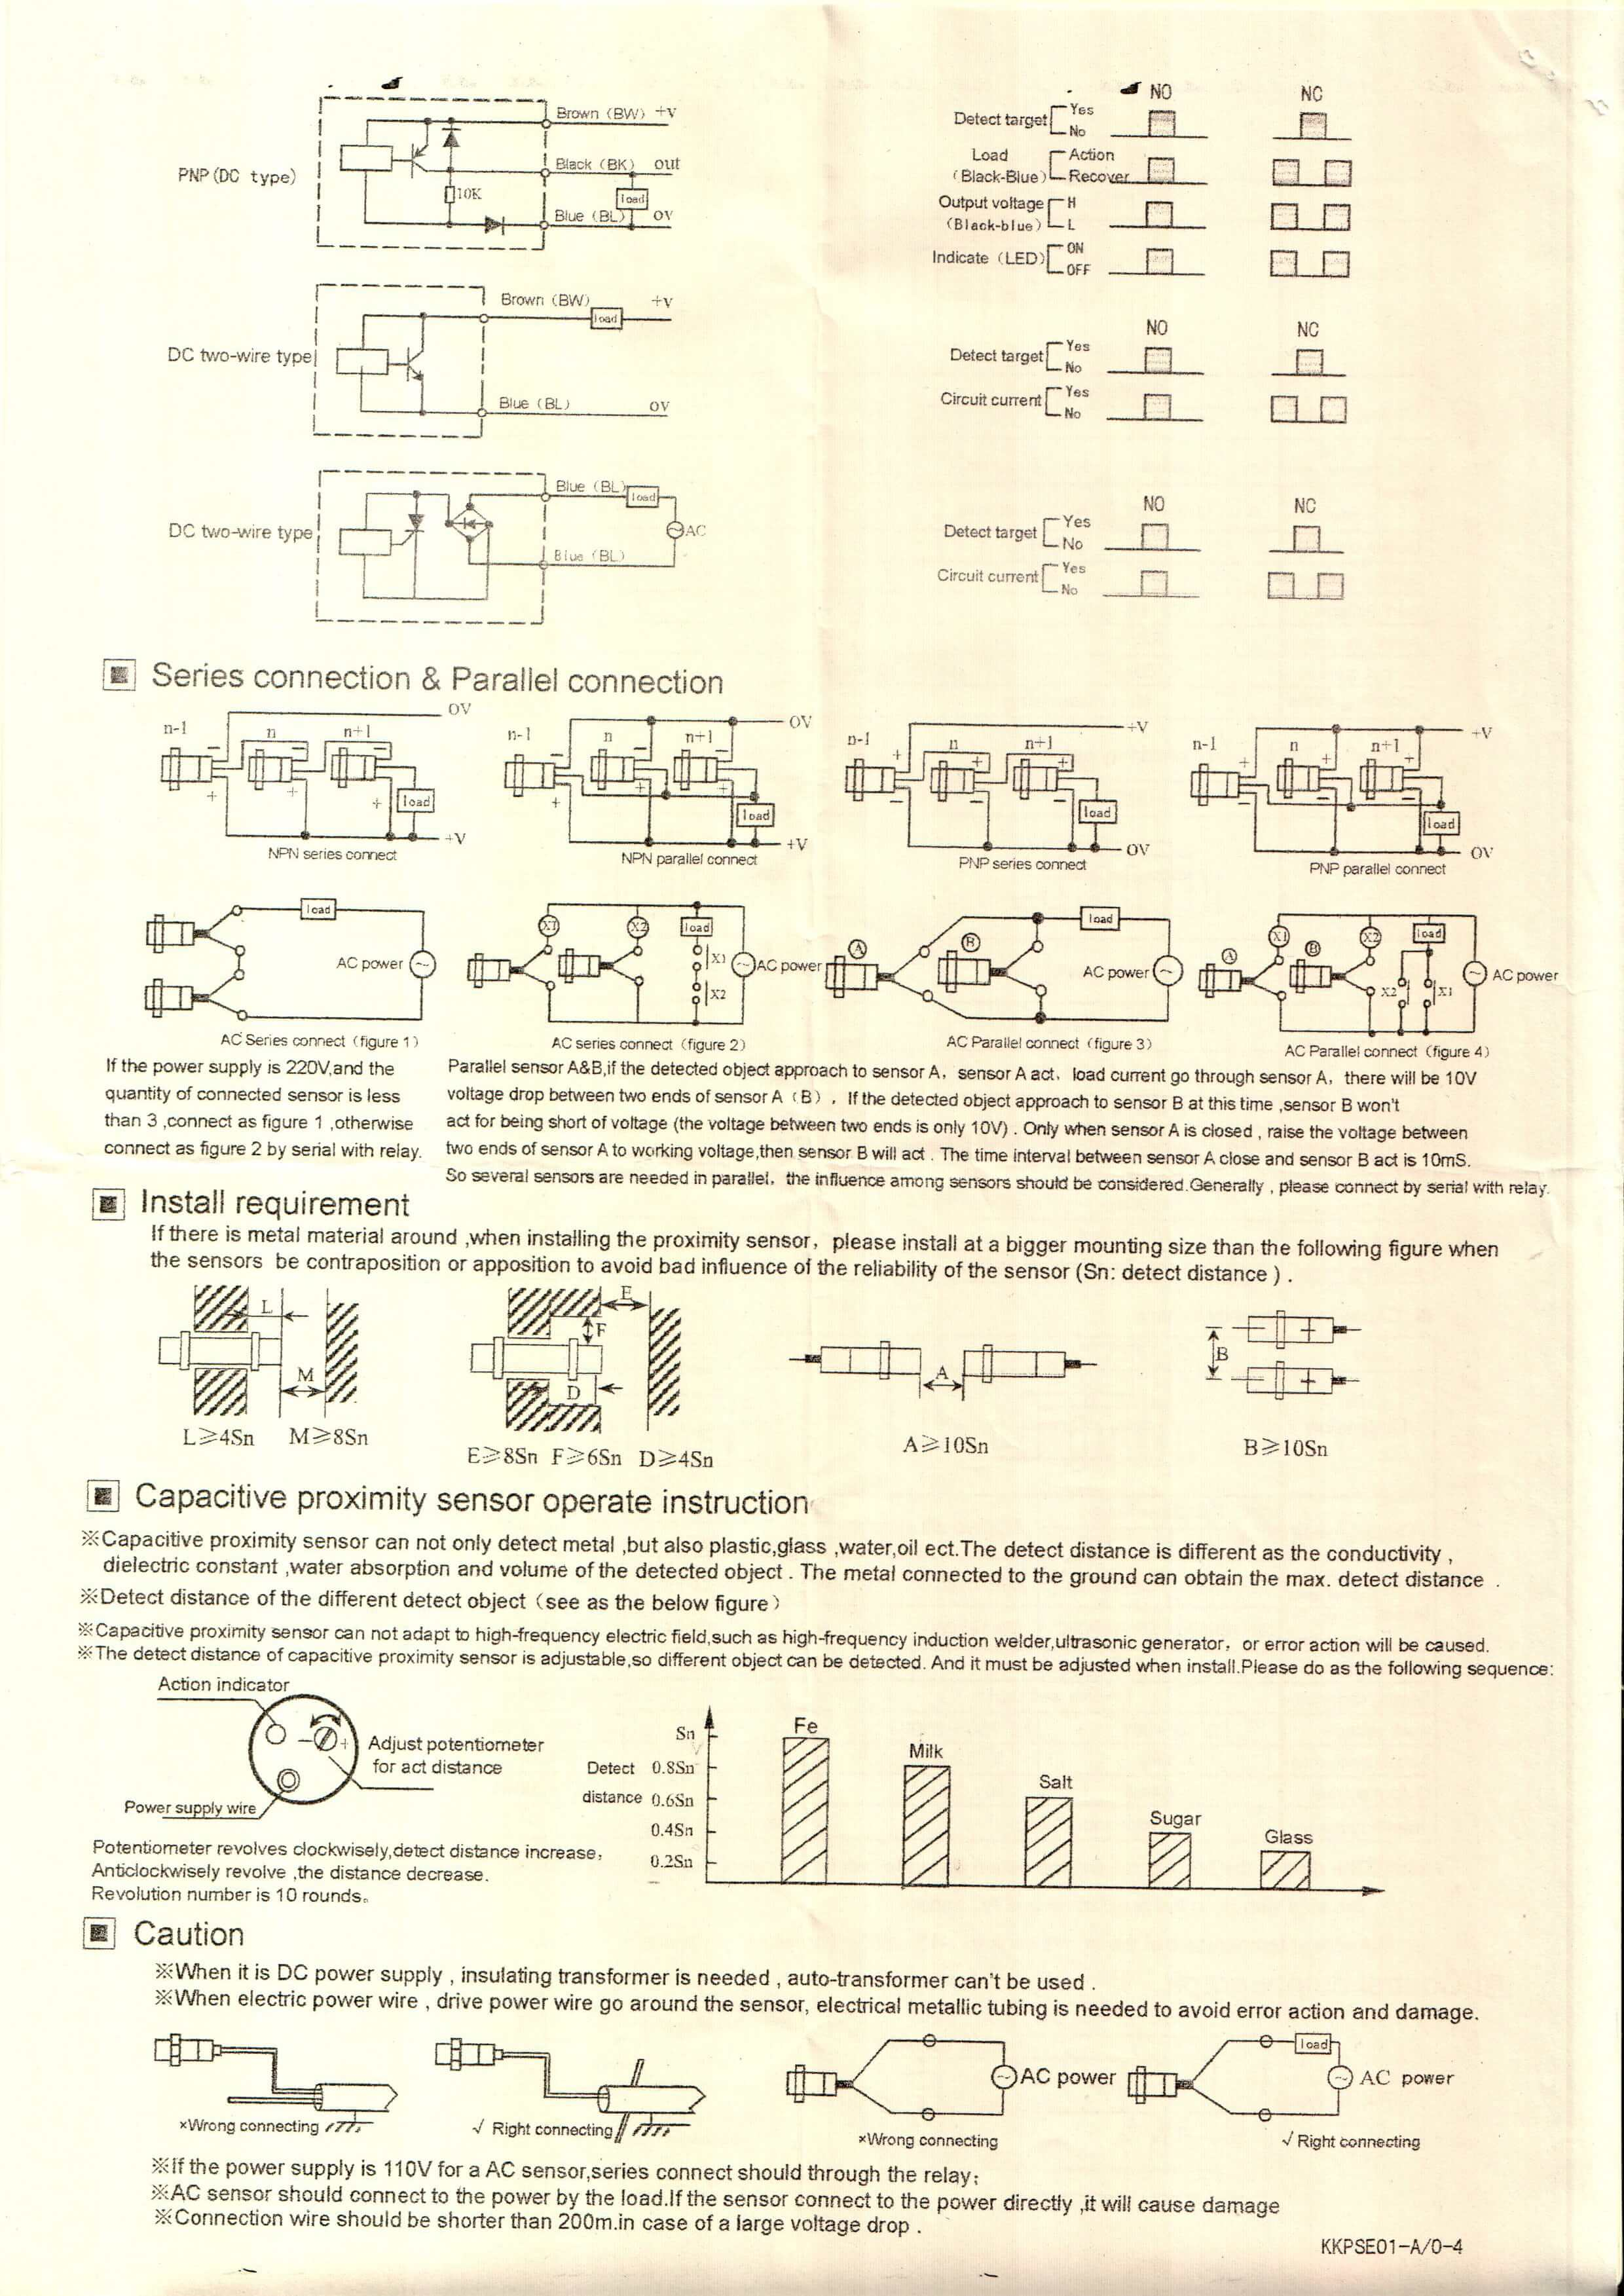 PS INFO 4 - سنسور القایی توکی Toky مدل PS-HN35C